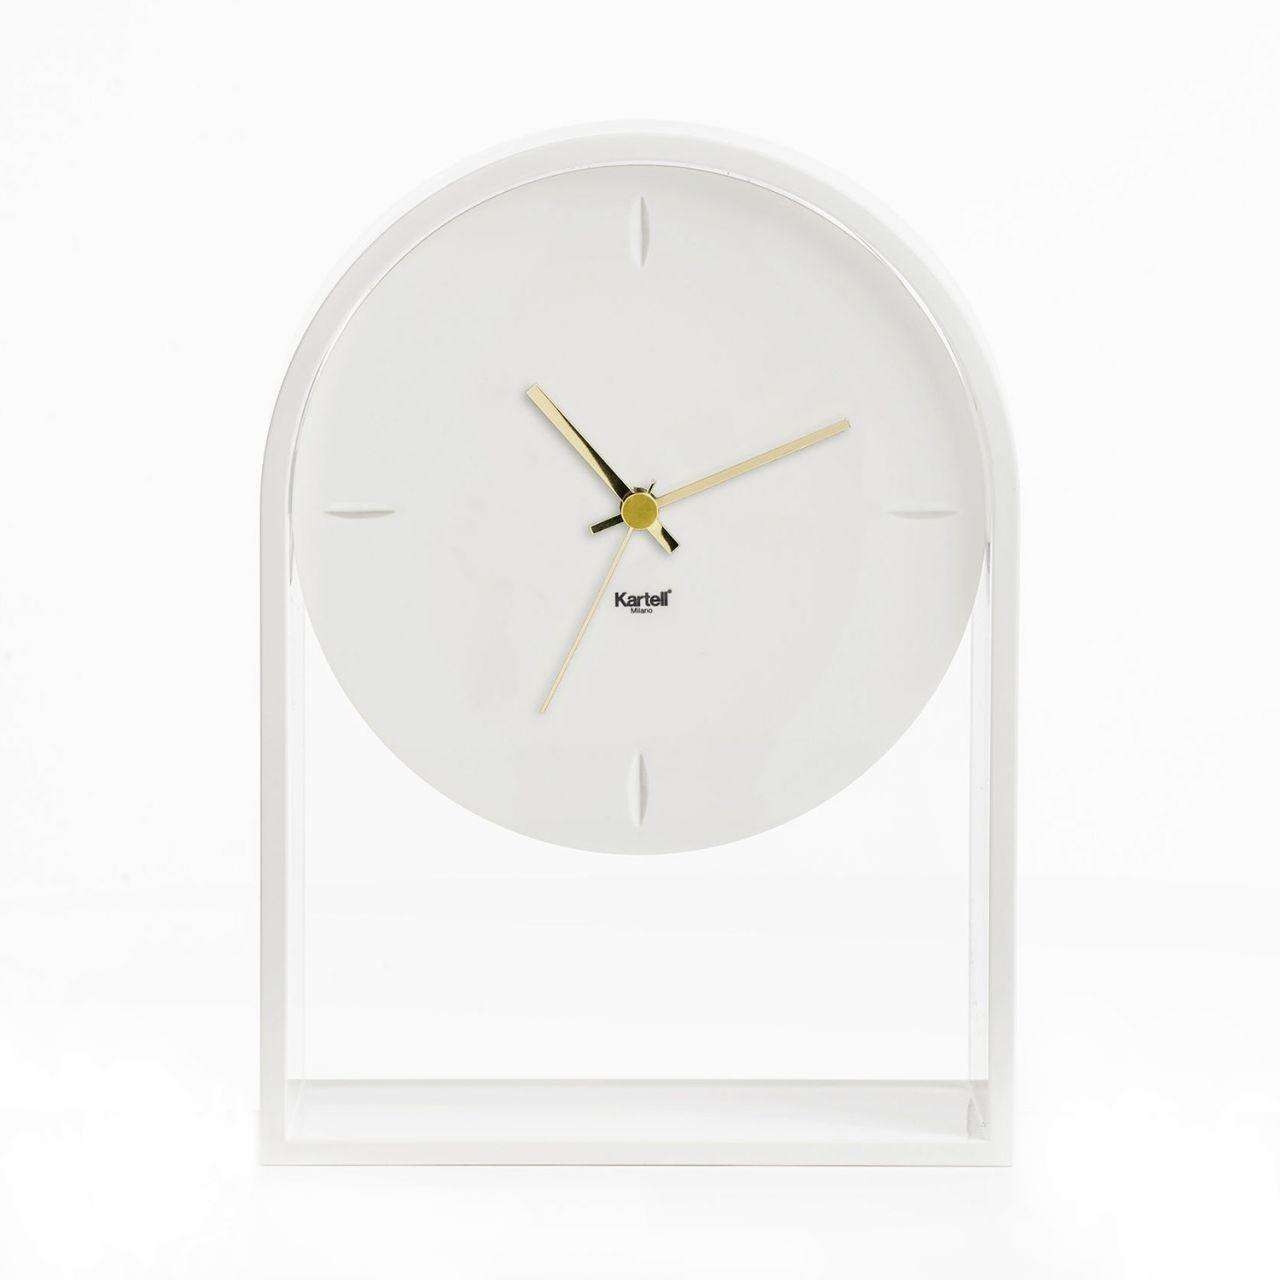 Kartell - Air du Temps Tischstanduhr